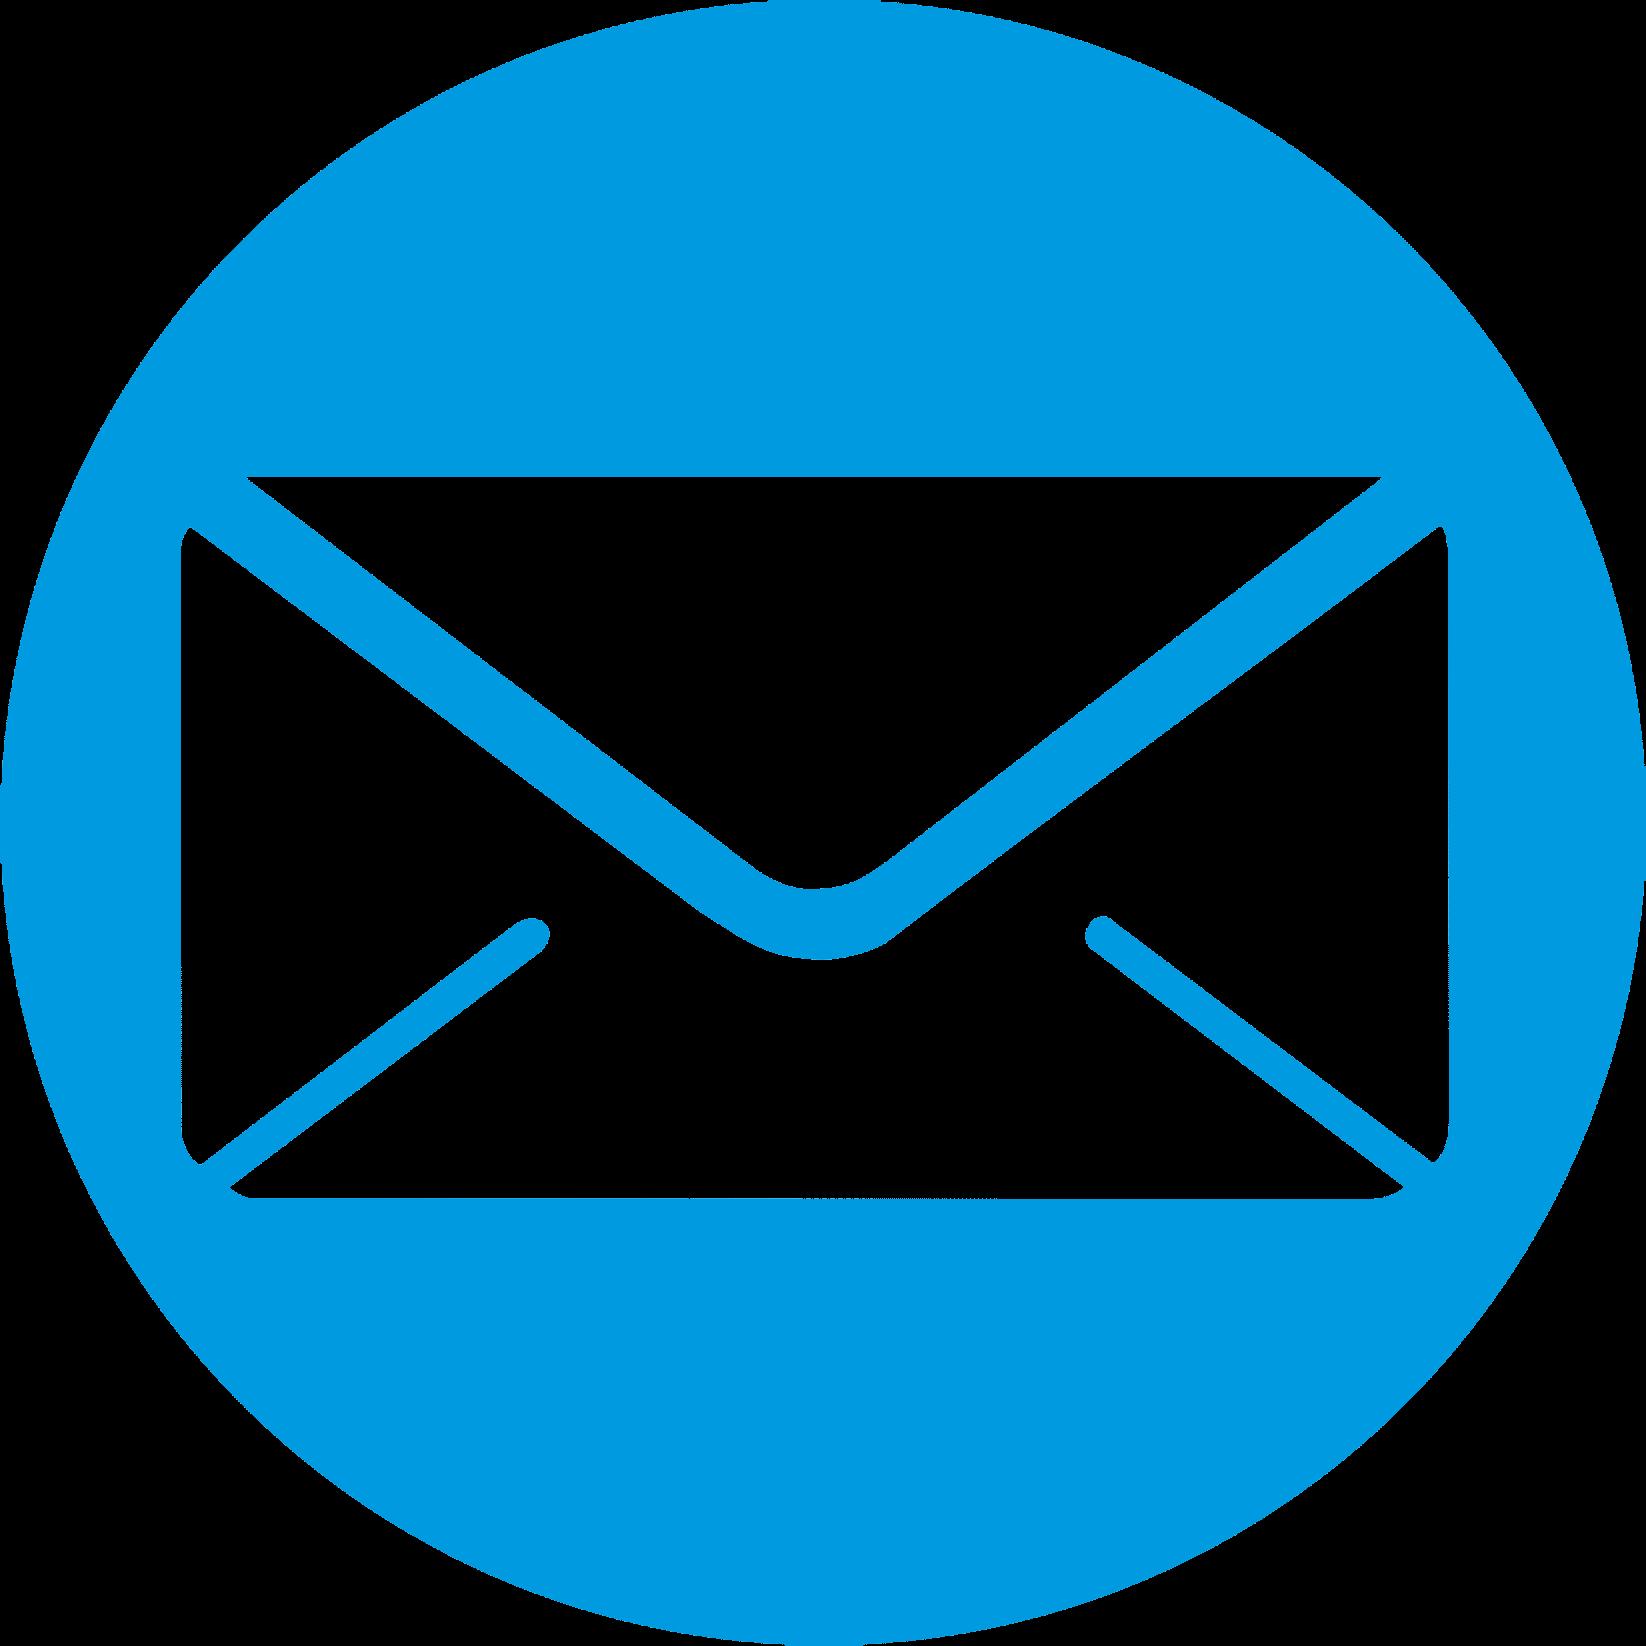 icono-mail   Baileactivo